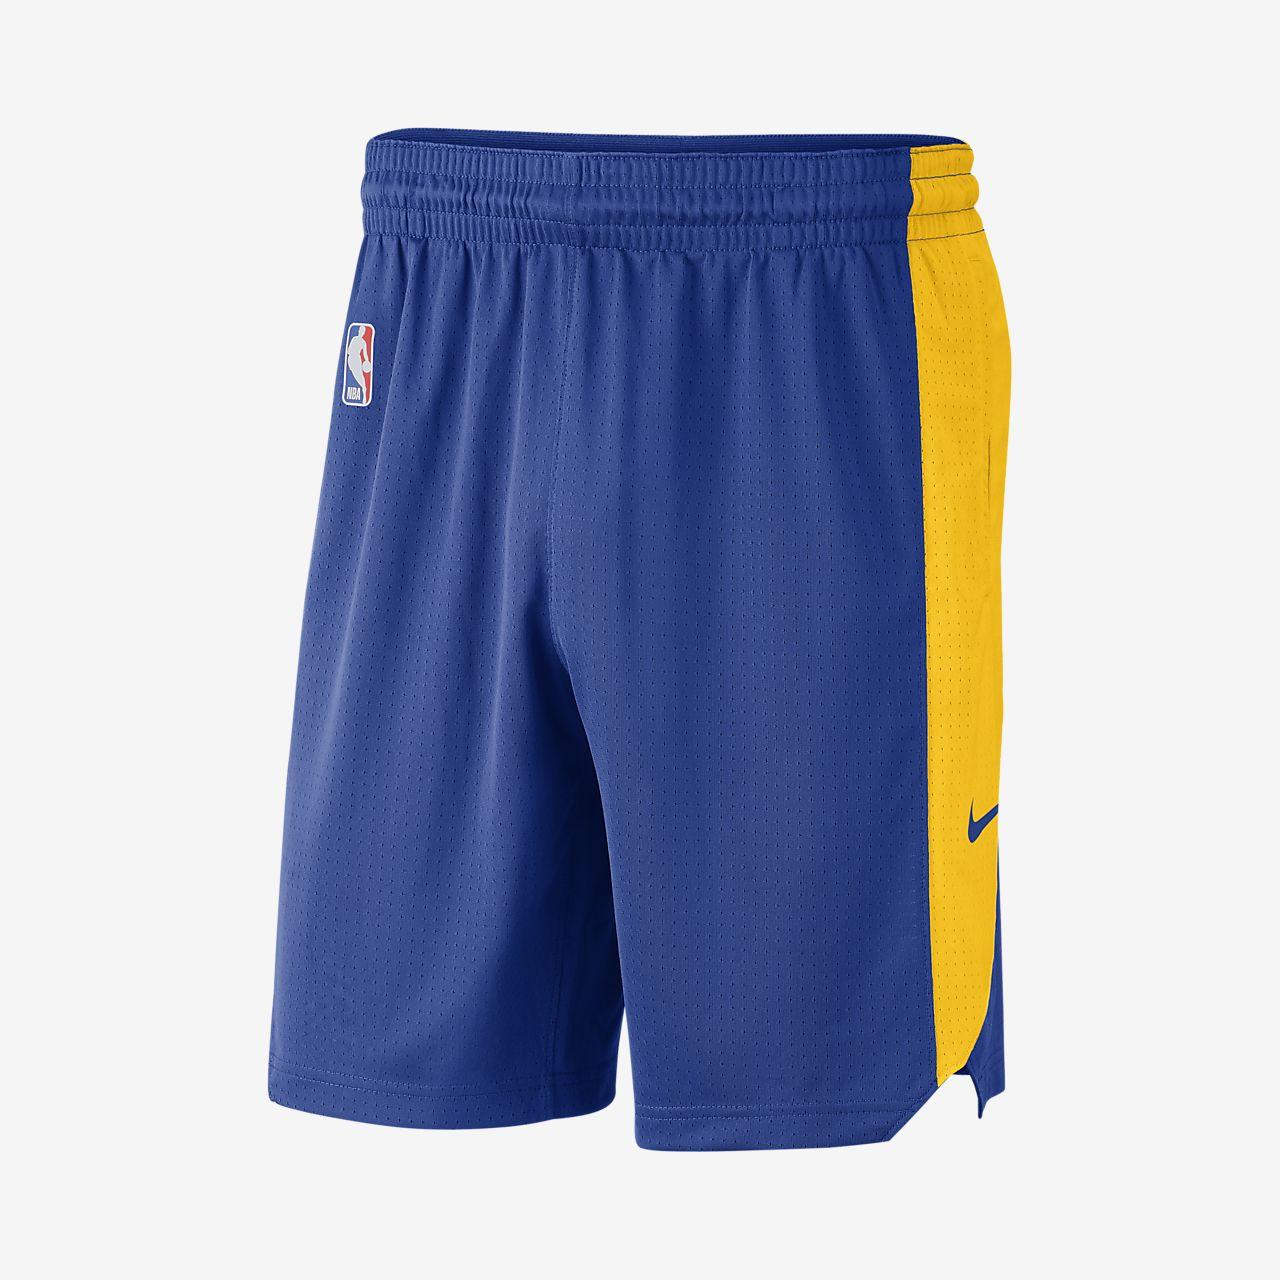 Męskie spodenki treningowe NBA Golden State Warriors Nike